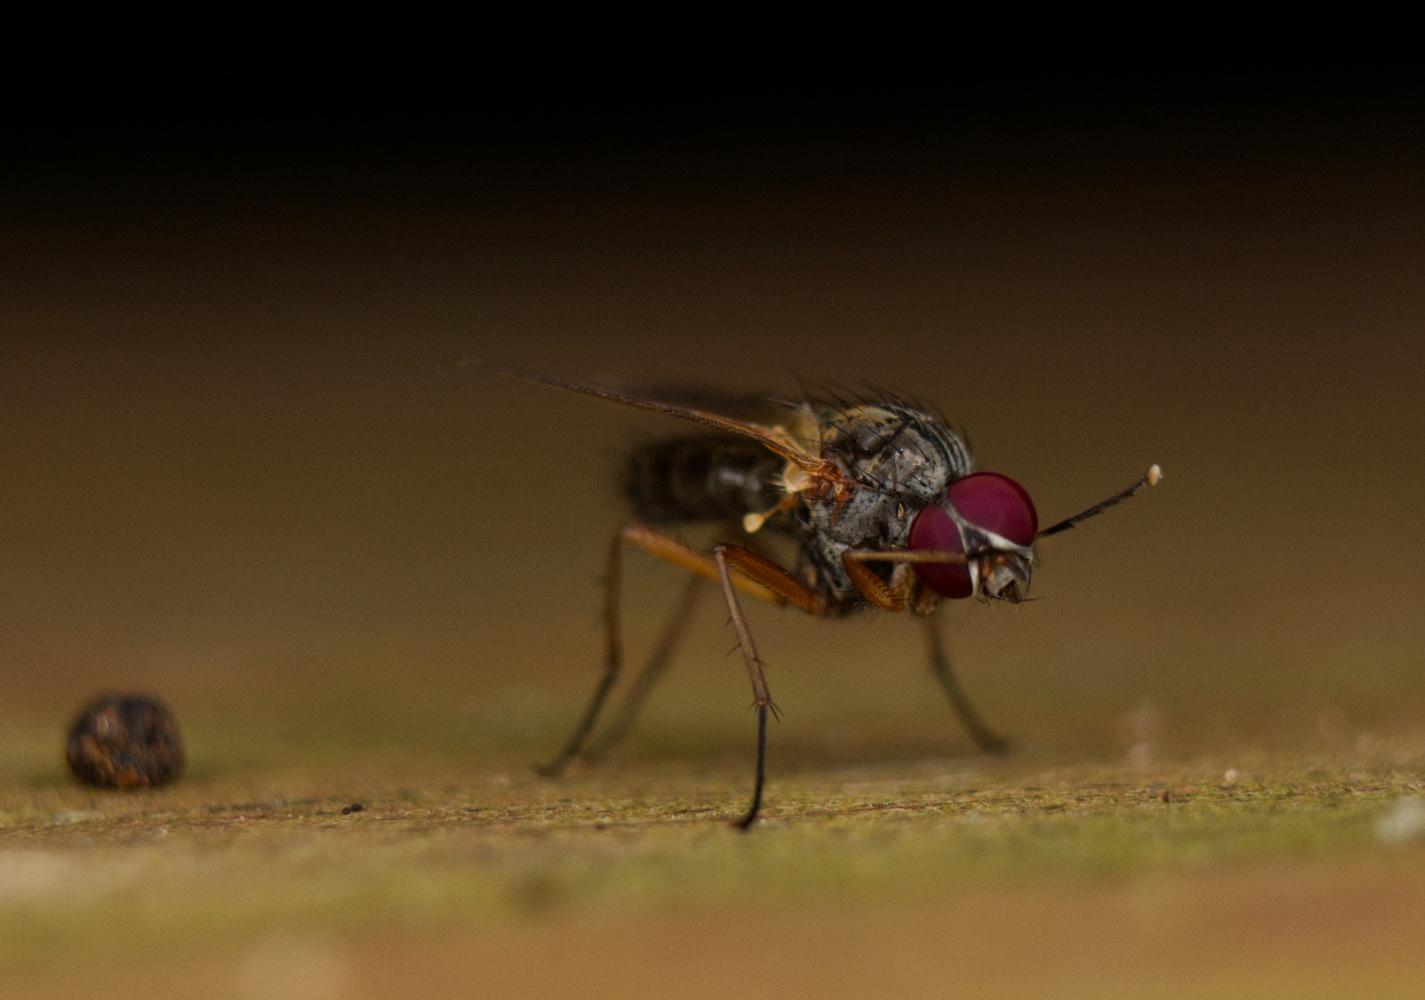 Dabbing Fly by Brett Ridings